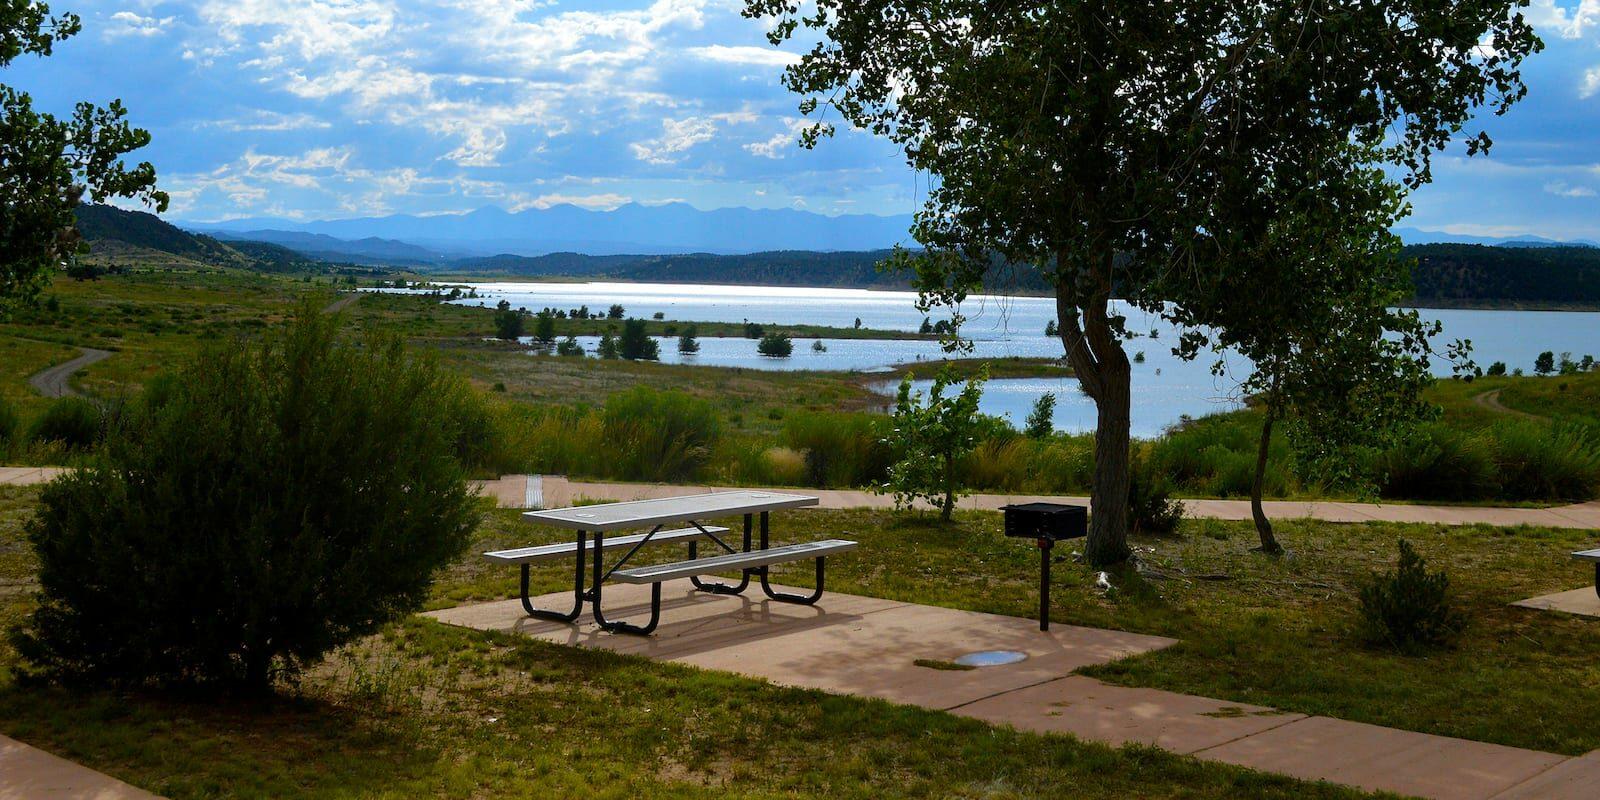 Trinidad Lake State Park Colorado Picnic Area